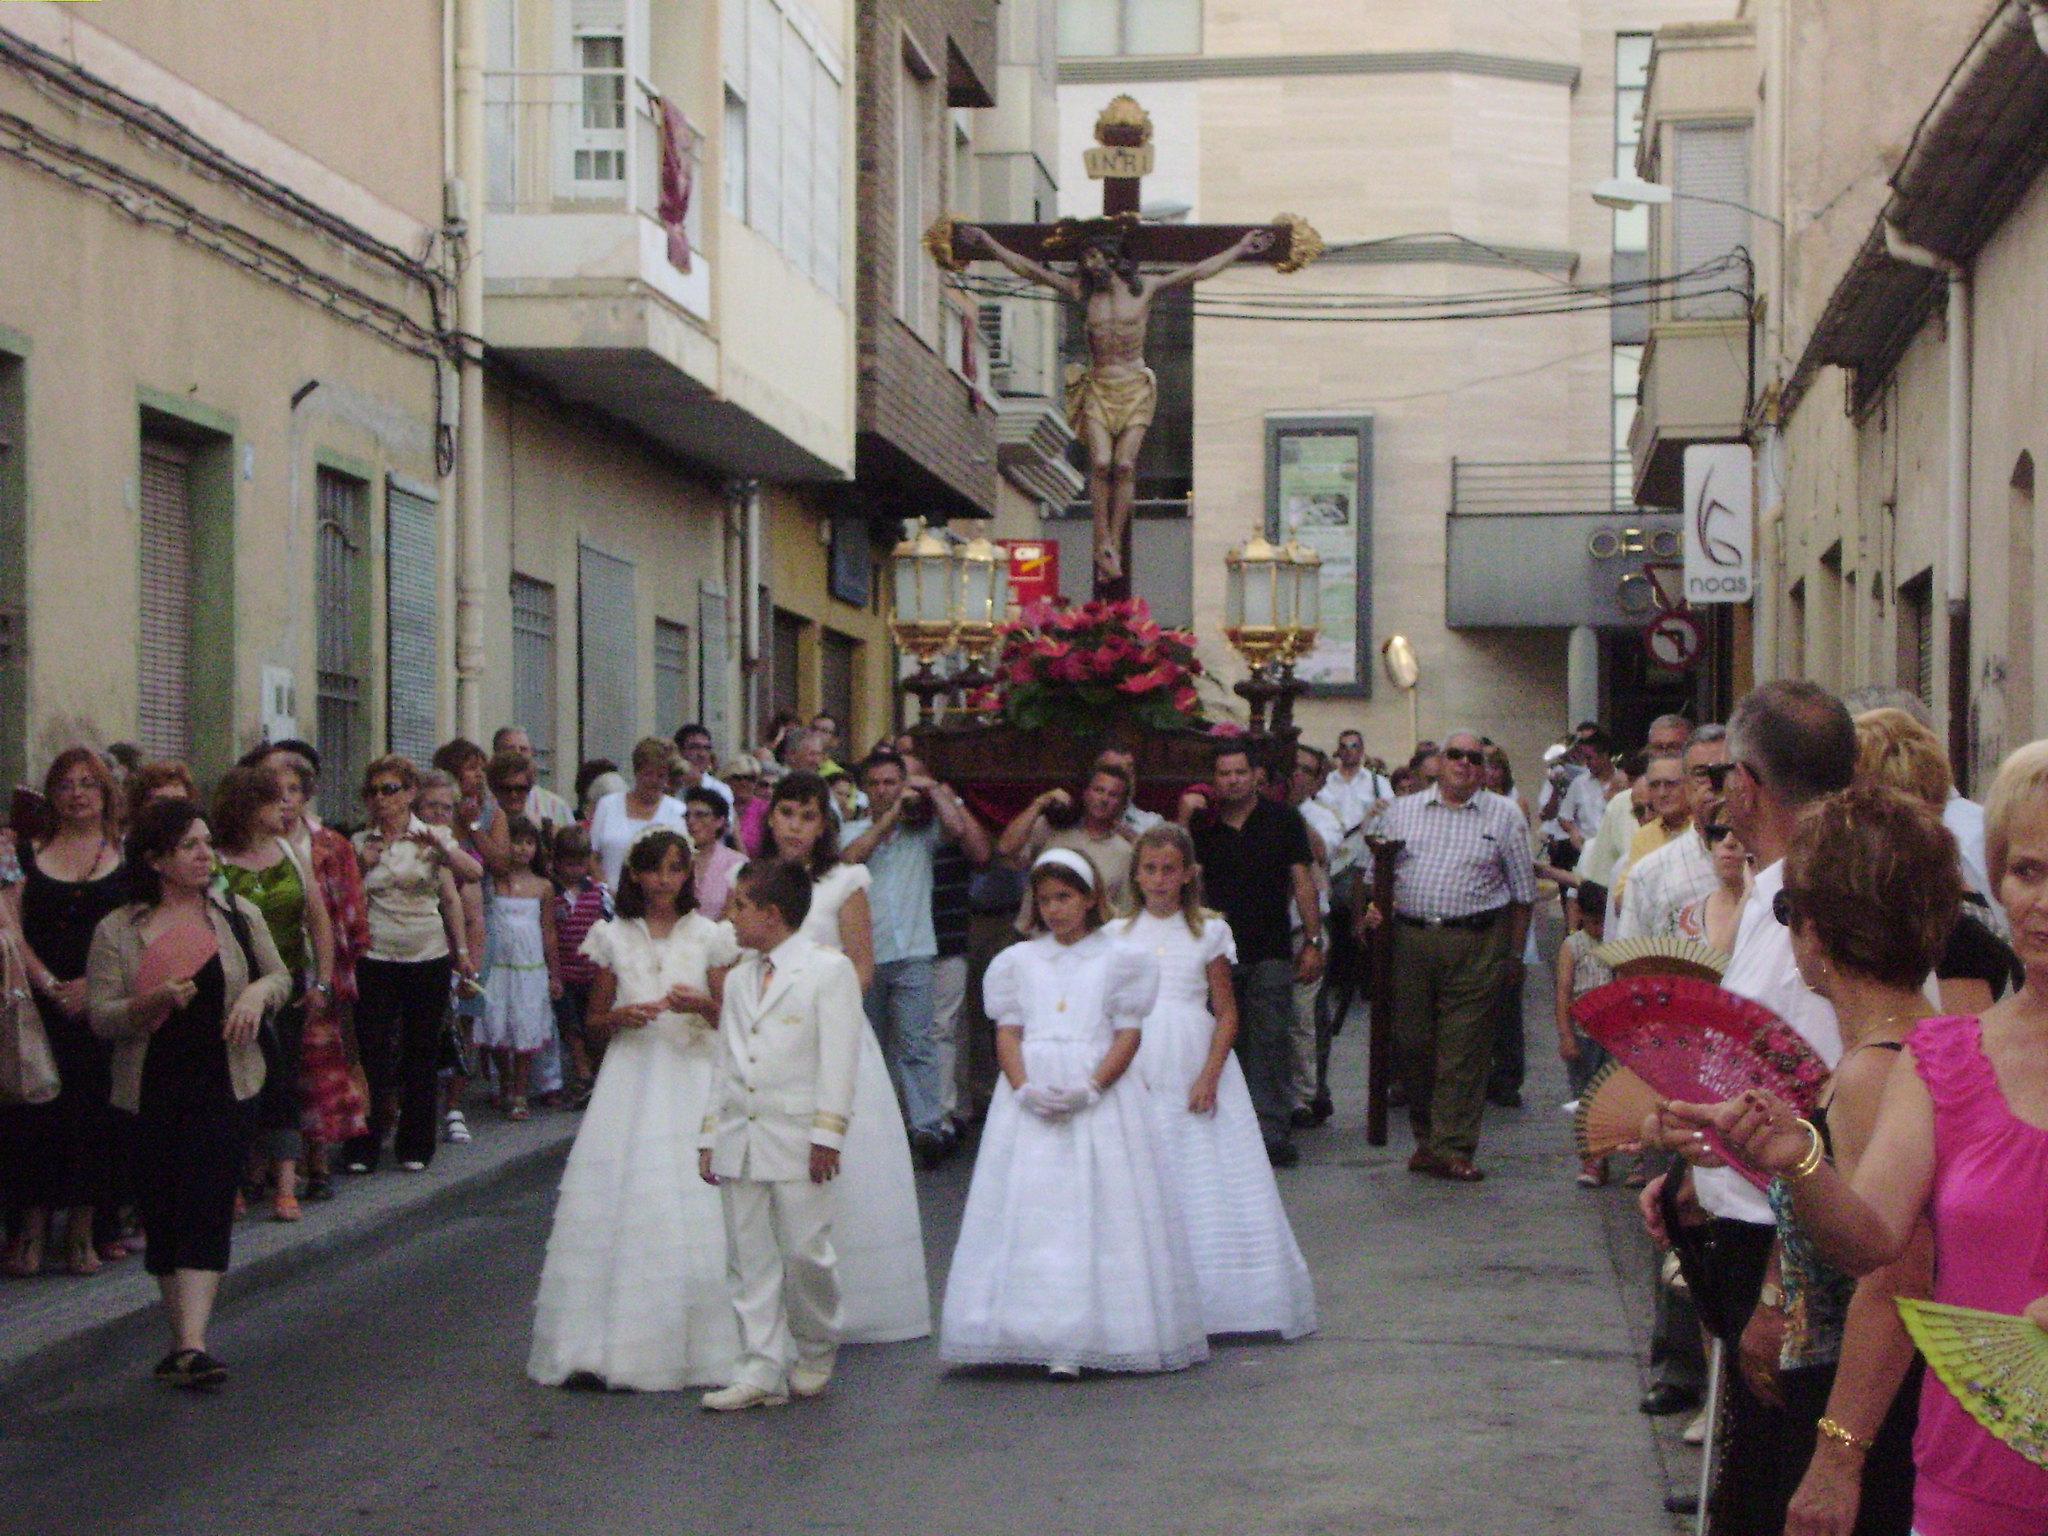 (2009-07-05) - Procesión Subida - Javier Romero Ripoll - (09)